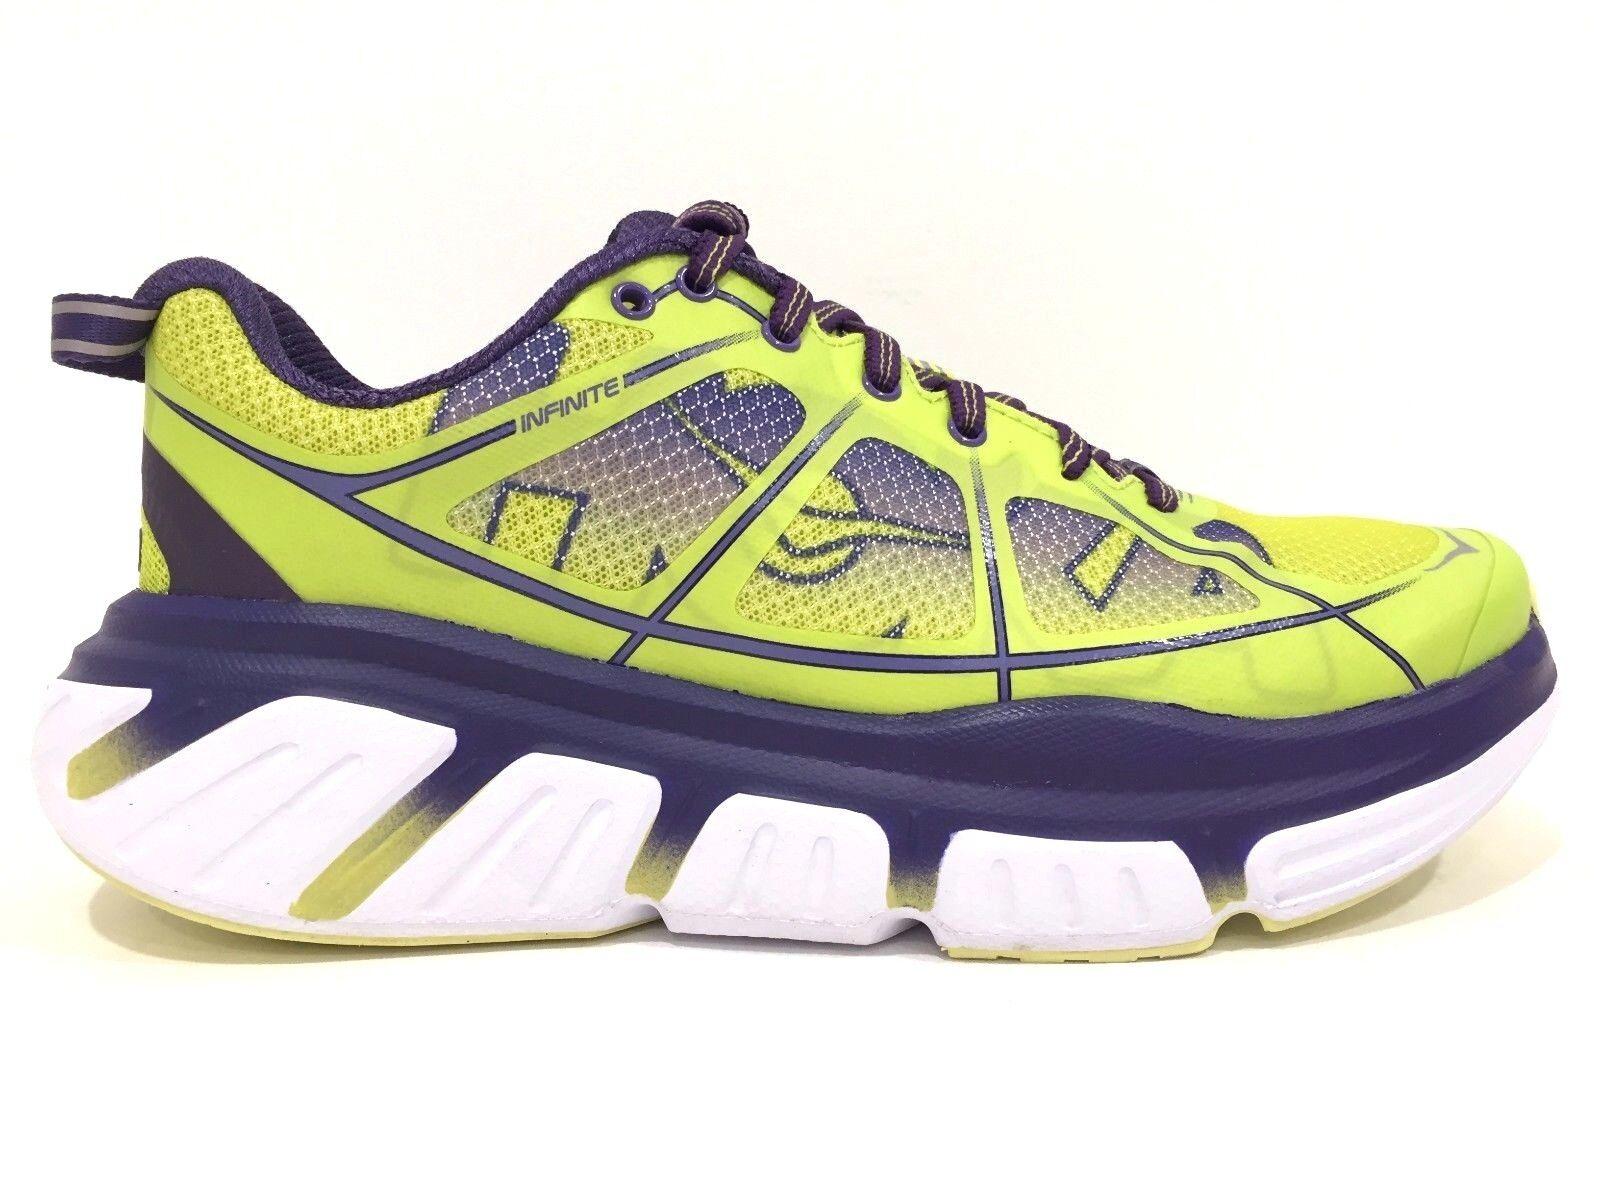 Hoka One One Infinite Running scarpe da ginnastica scarpe - Acid - donna